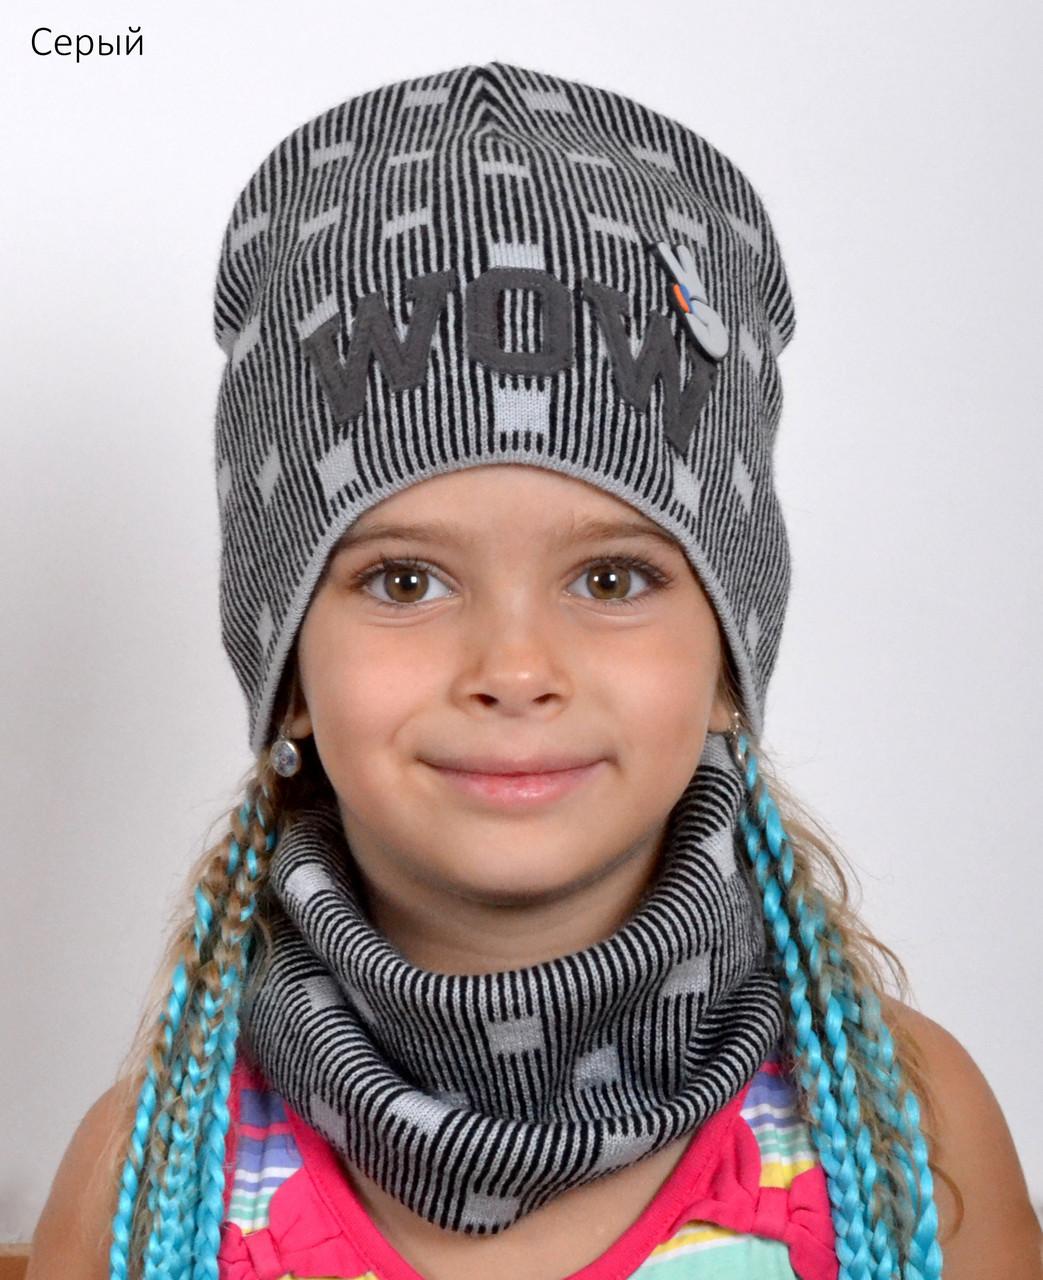 Двойная шапка осень/зима ✌ WOW ✌